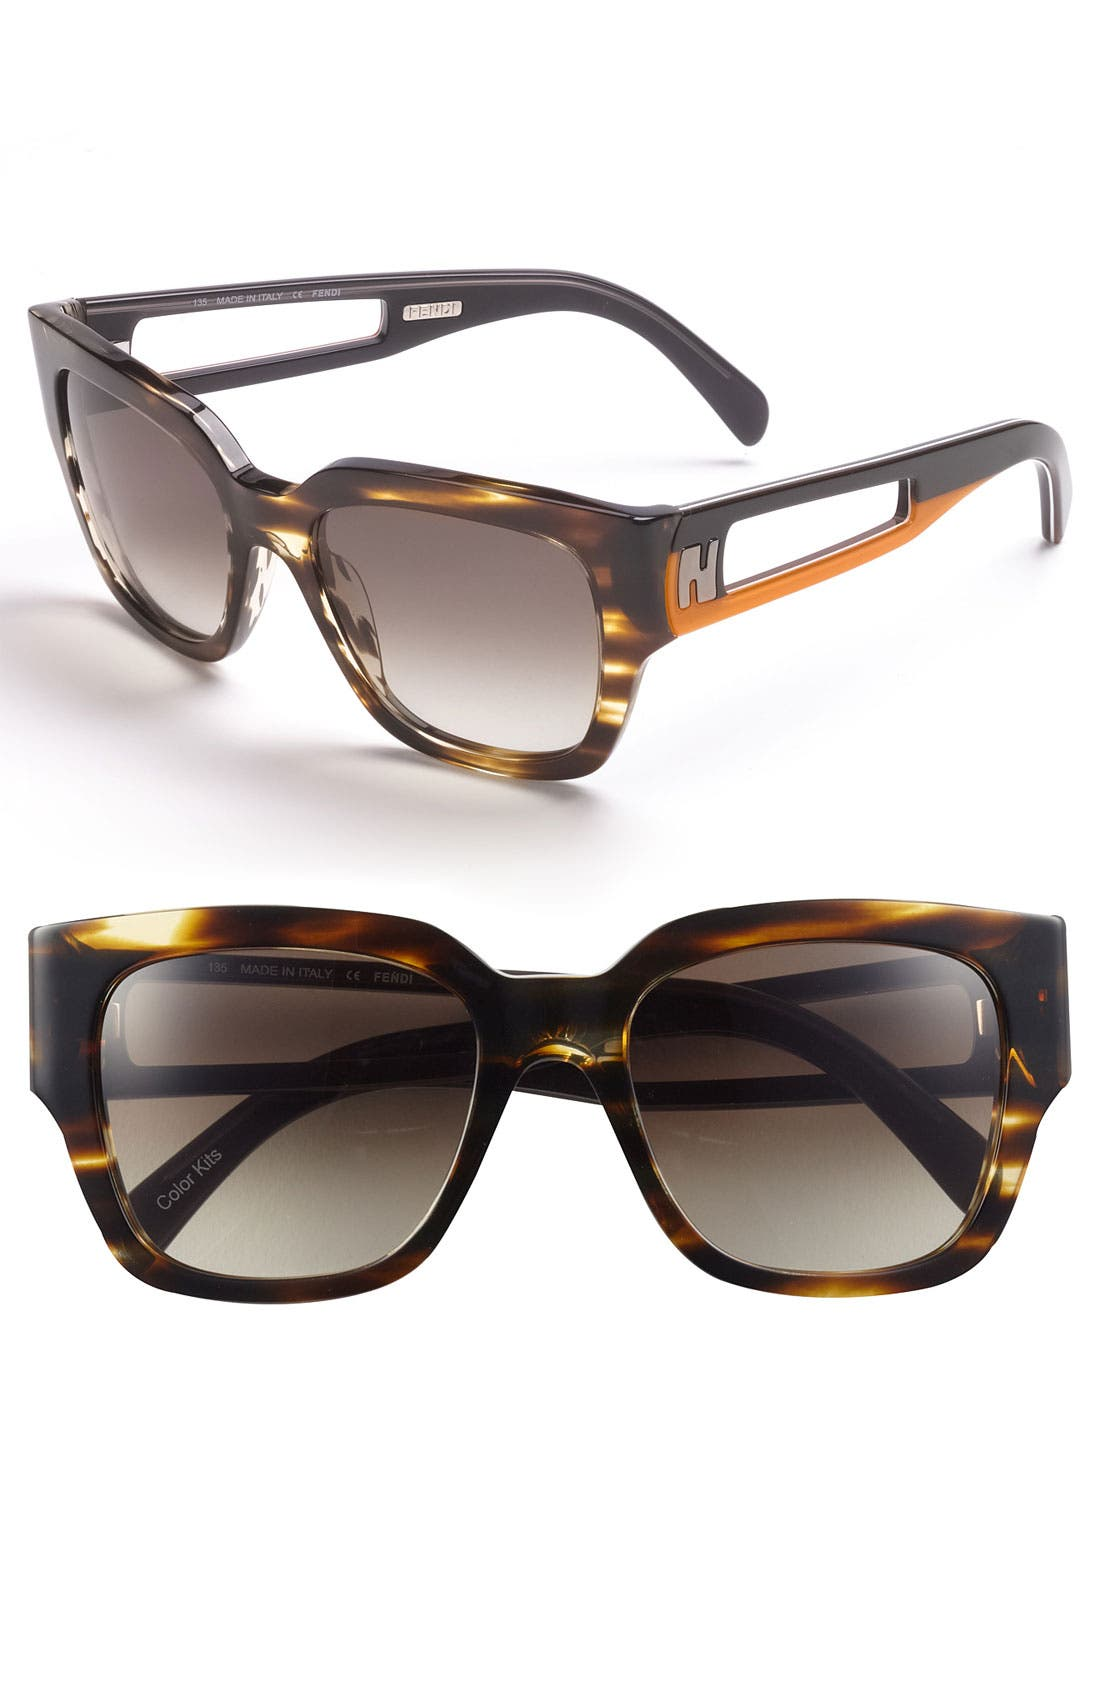 Alternate Image 1 Selected - Fendi 52mm Retro Sunglasses